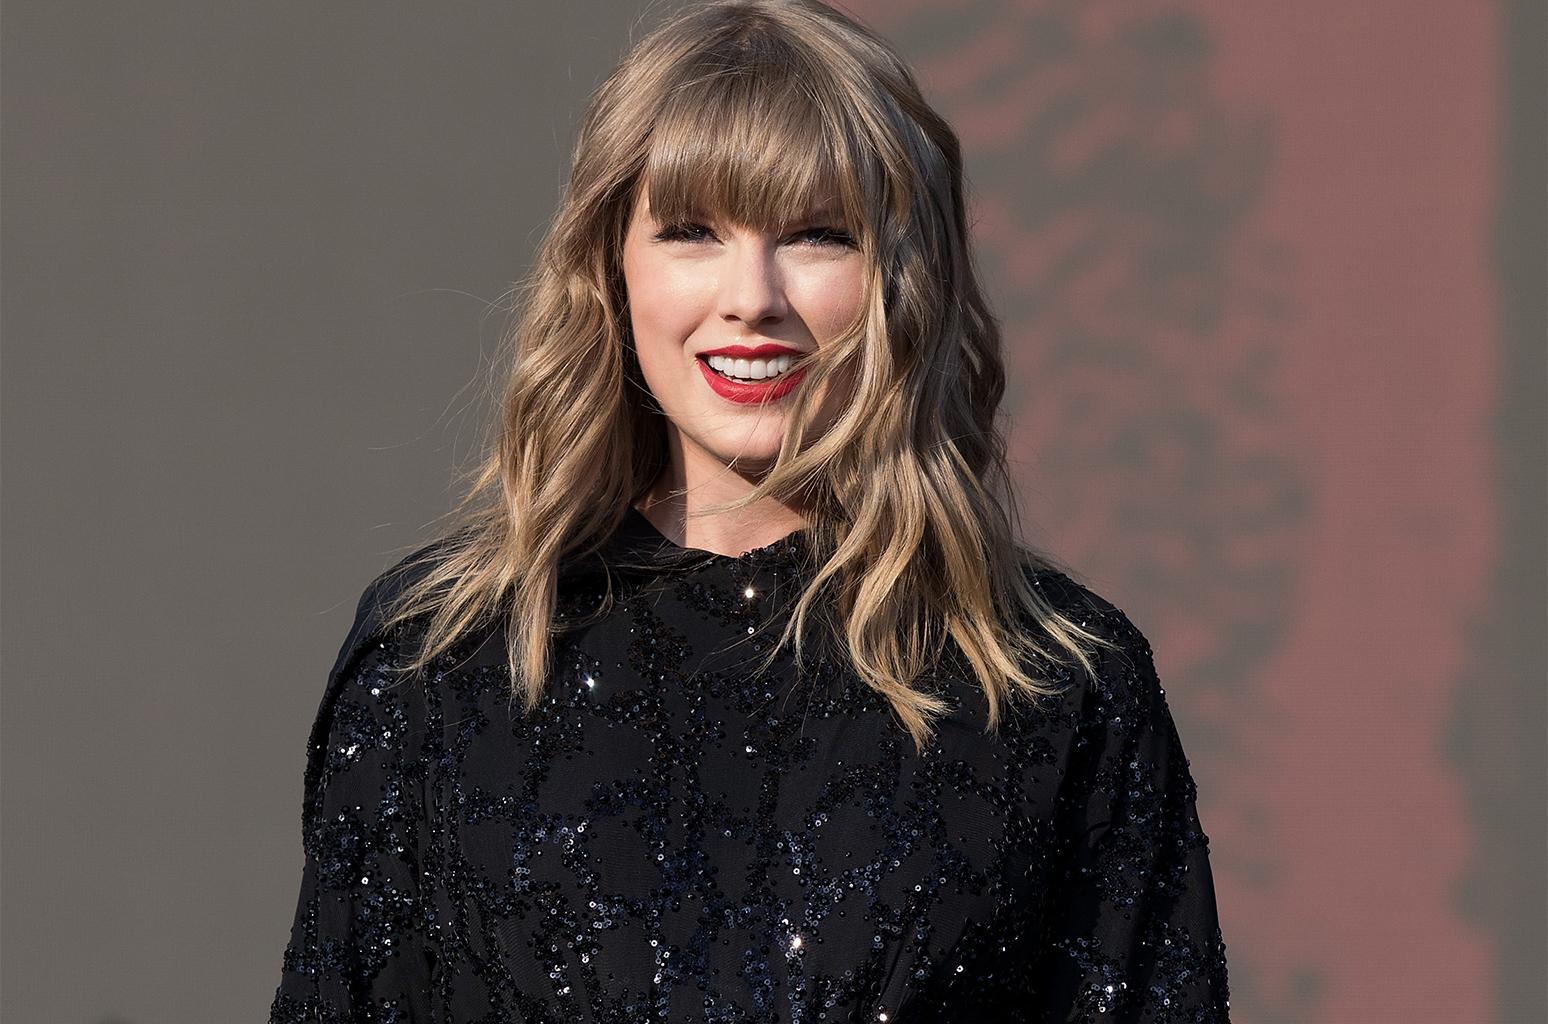 Taylor-Swift-2018-may-akl-billboard-1548